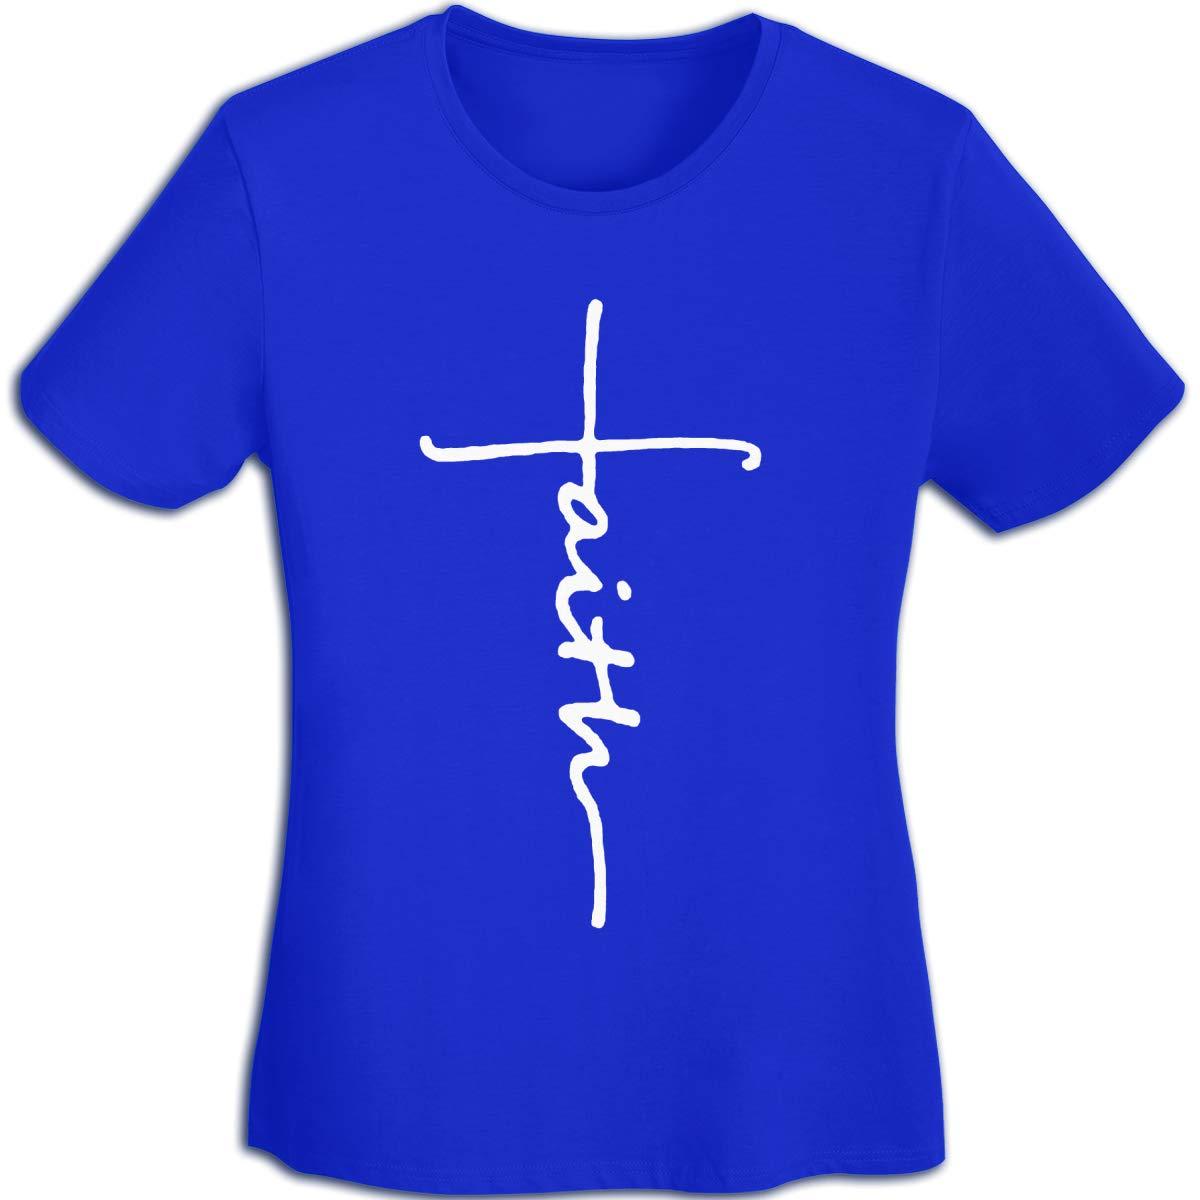 Women's T Shirt Cross Faith Shirts Jesus Tshirts Cotton Christian T-Shirt Short-Sleeve Tshirt for Women Youth Girls Blue XL by BKashy